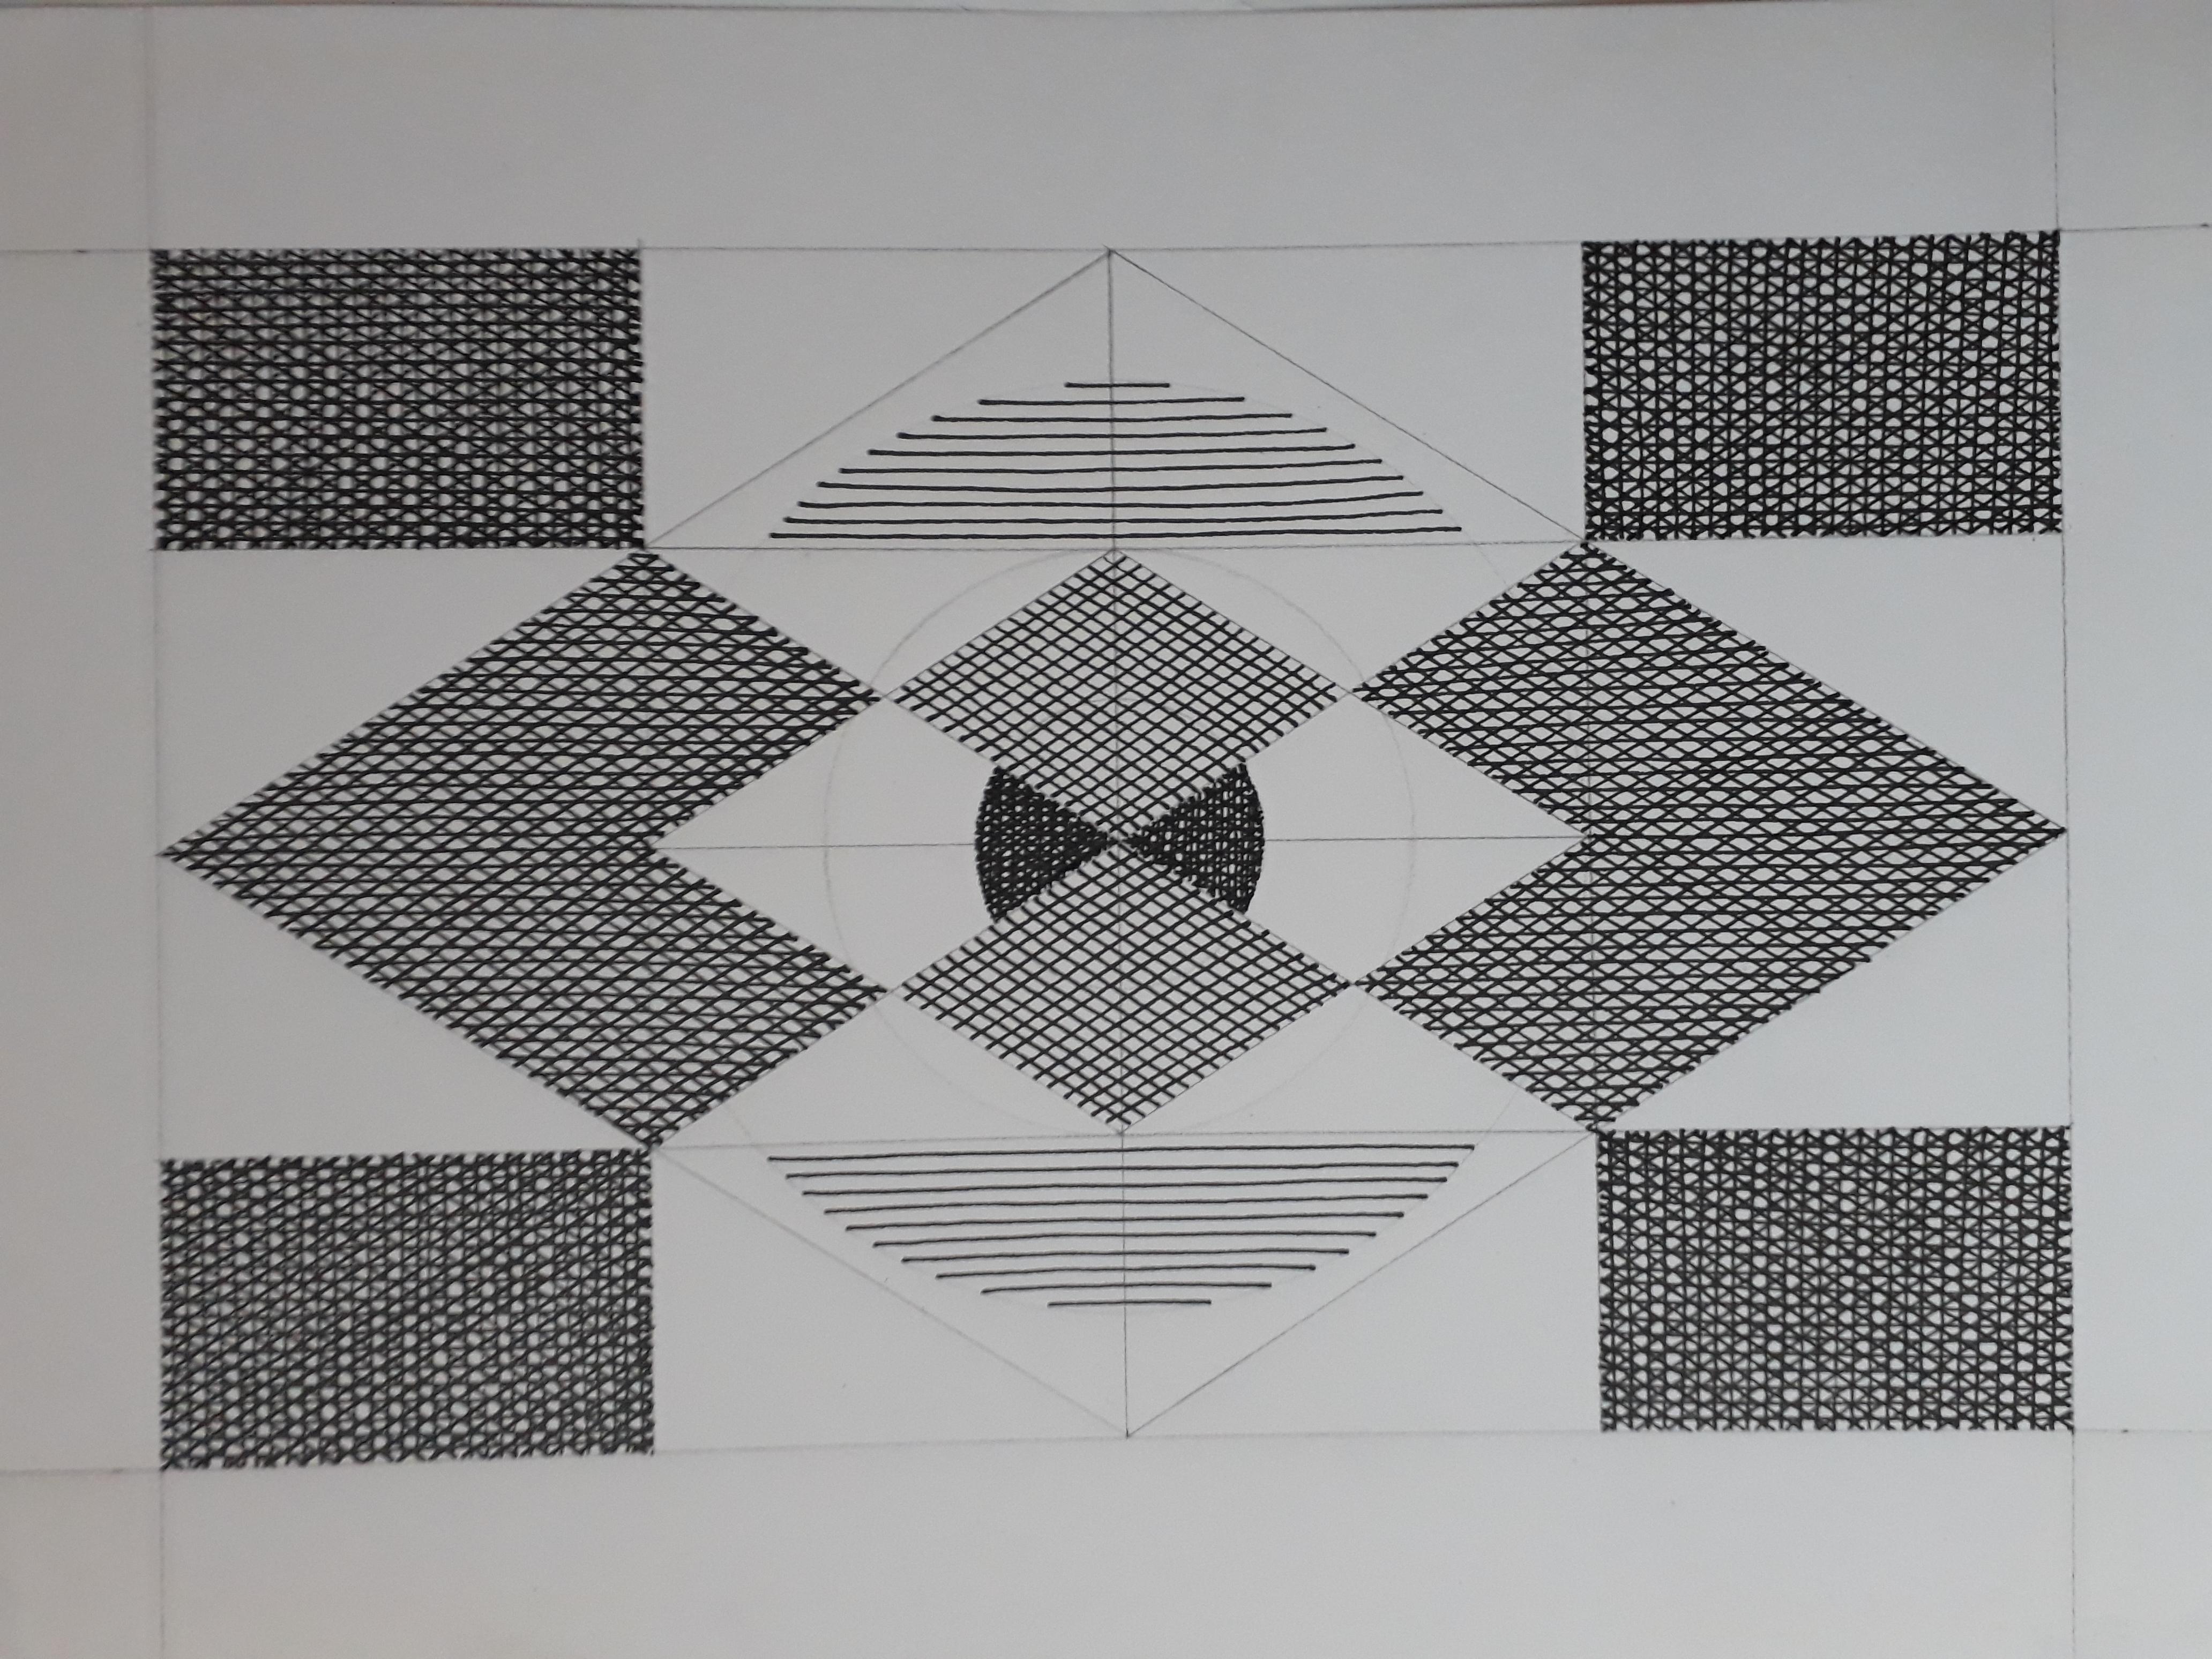 Claudia Osorio. Frecuencias. Dibujo sobre papel fabriano. 30 x 21 cm. 2018.